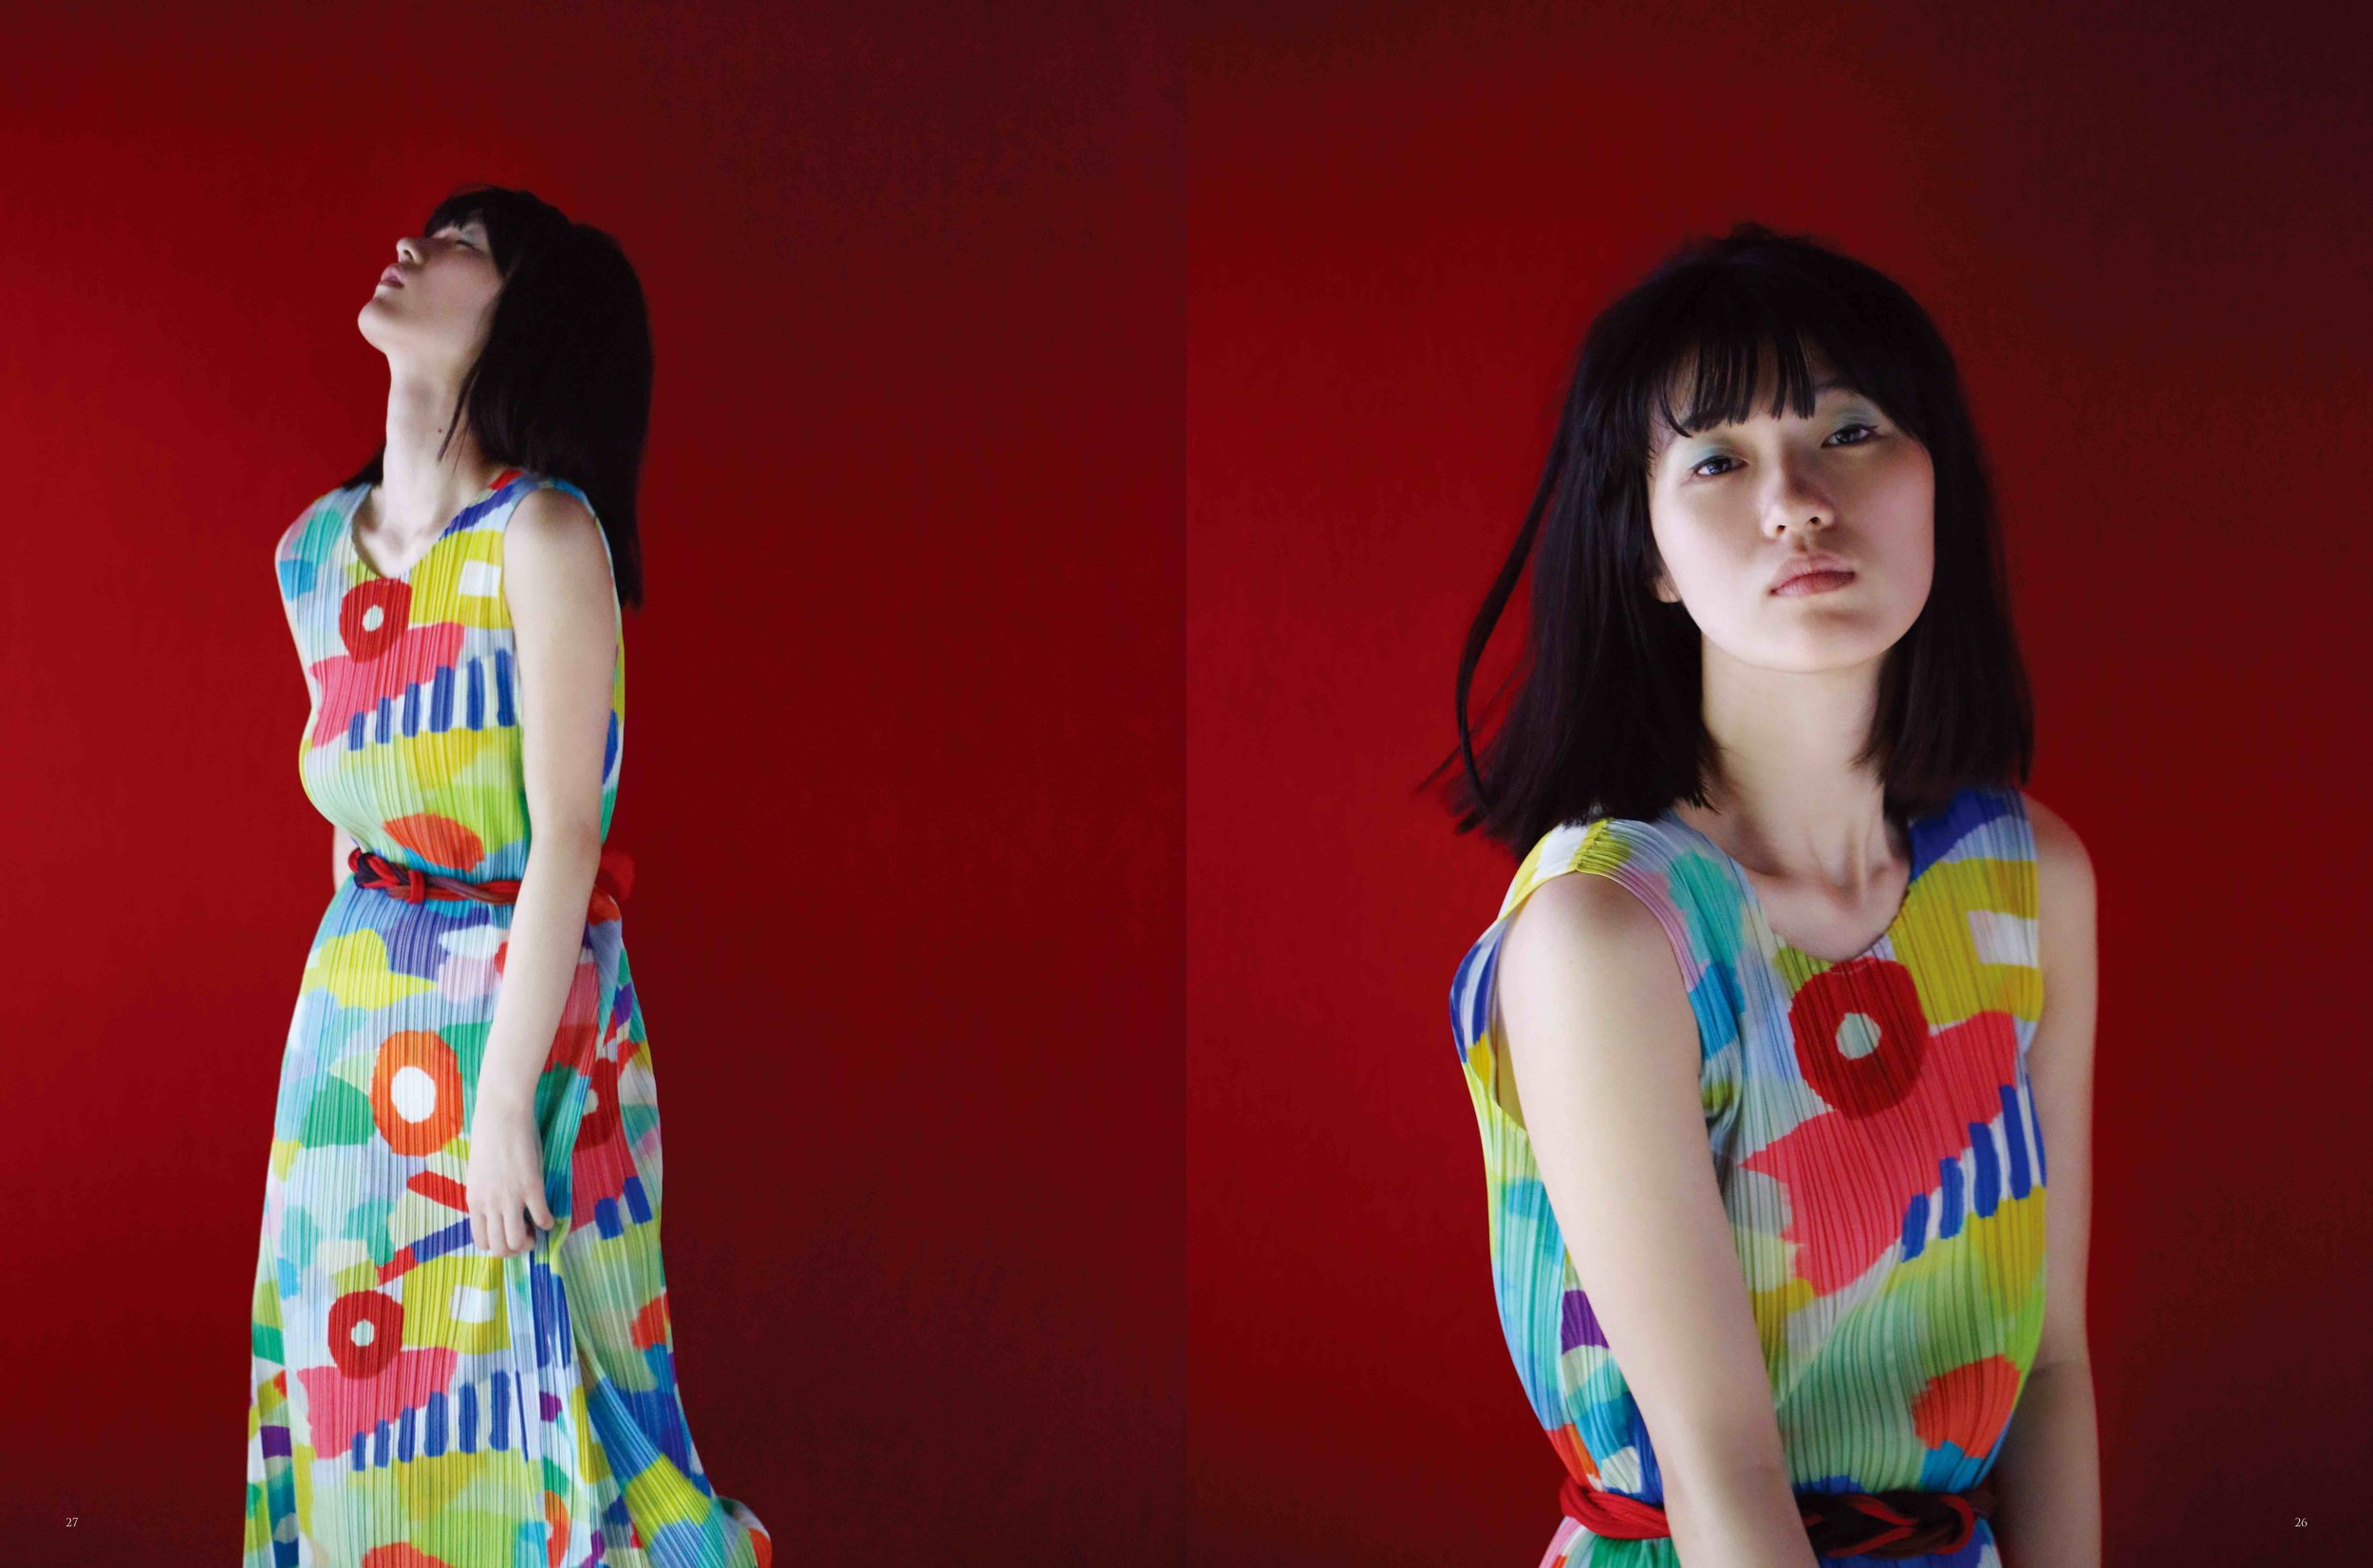 Shunkinsho | Manami usamaru | photography by MAKI TAGUCHI